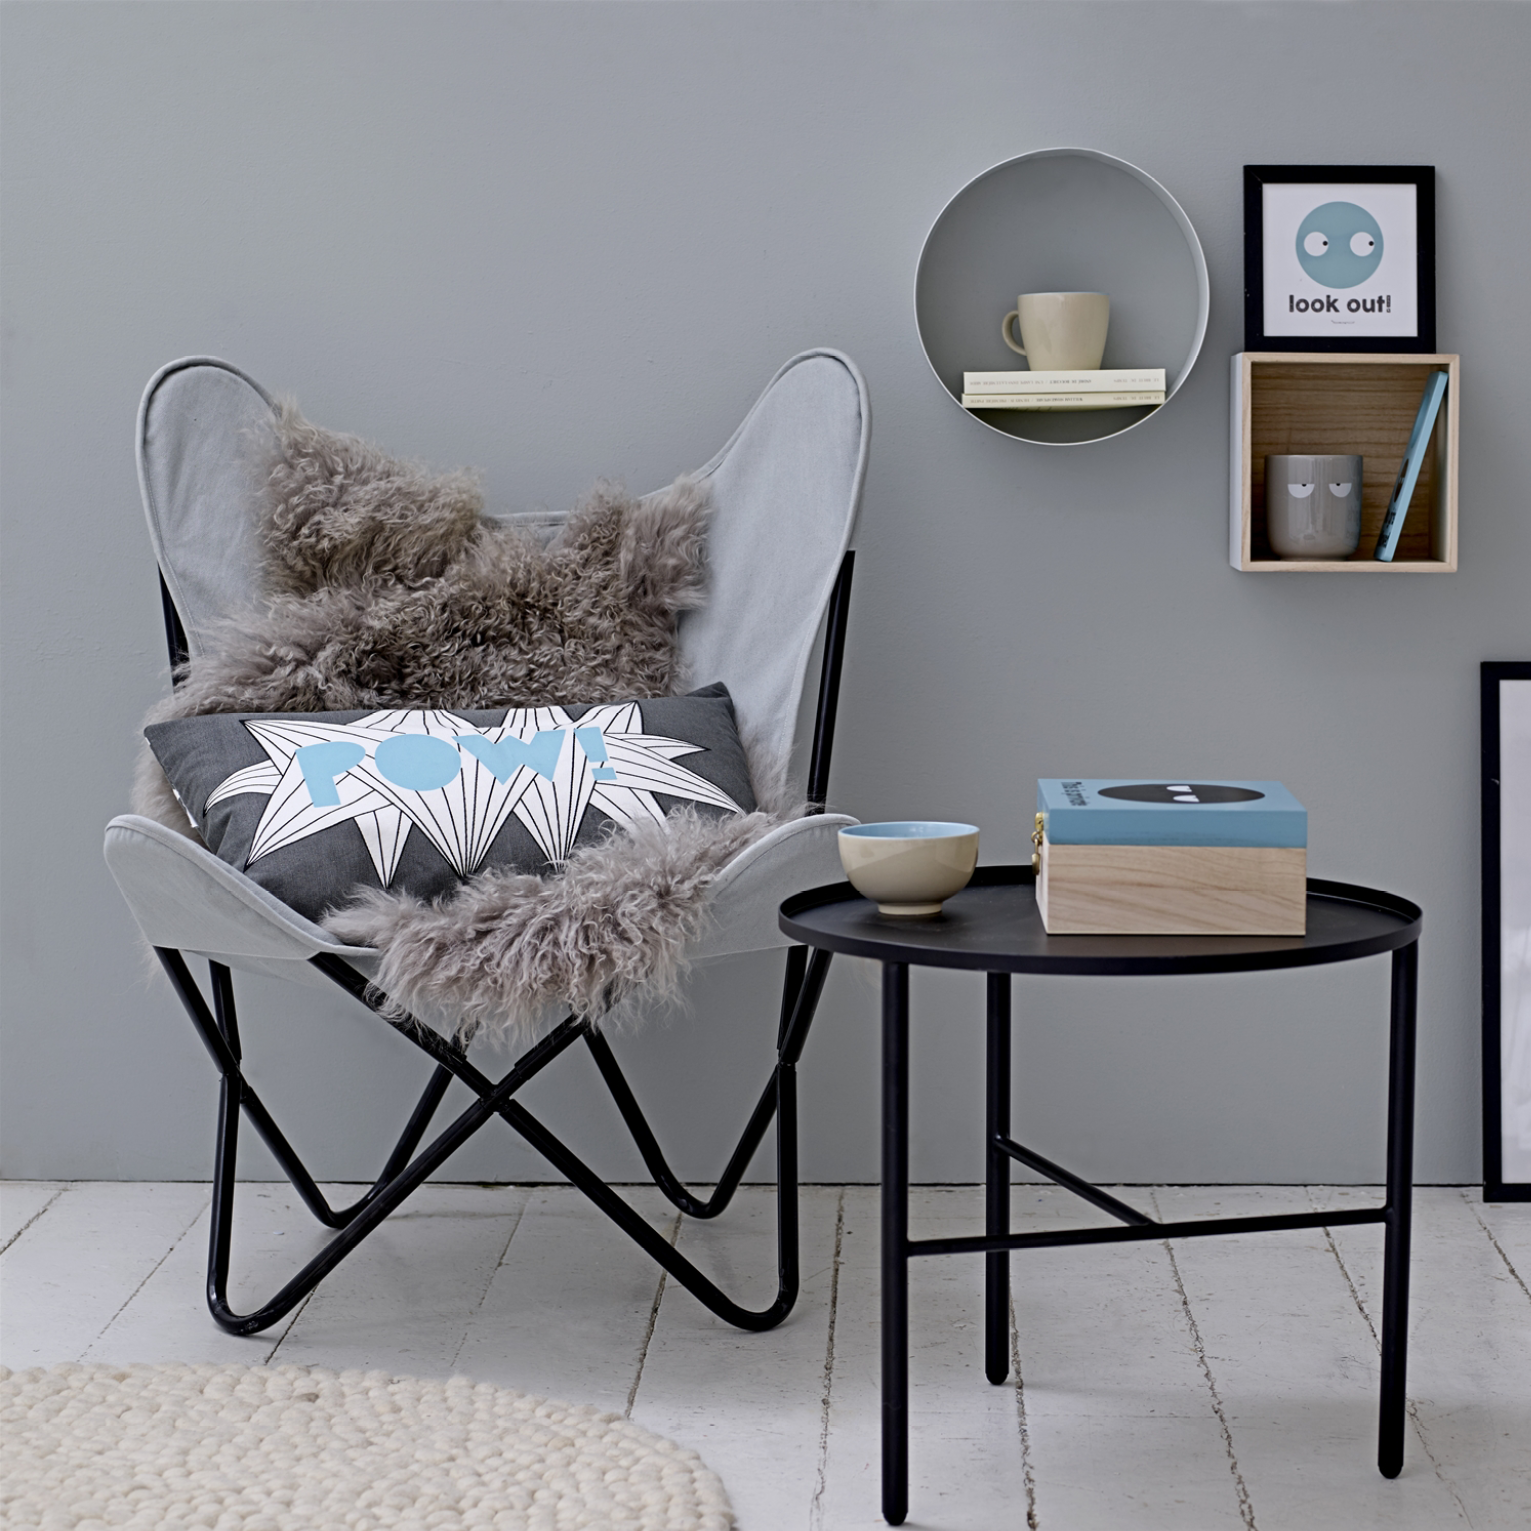 En sand klassiker Butterfly stol også kaldet flagermus stol, her fra ...